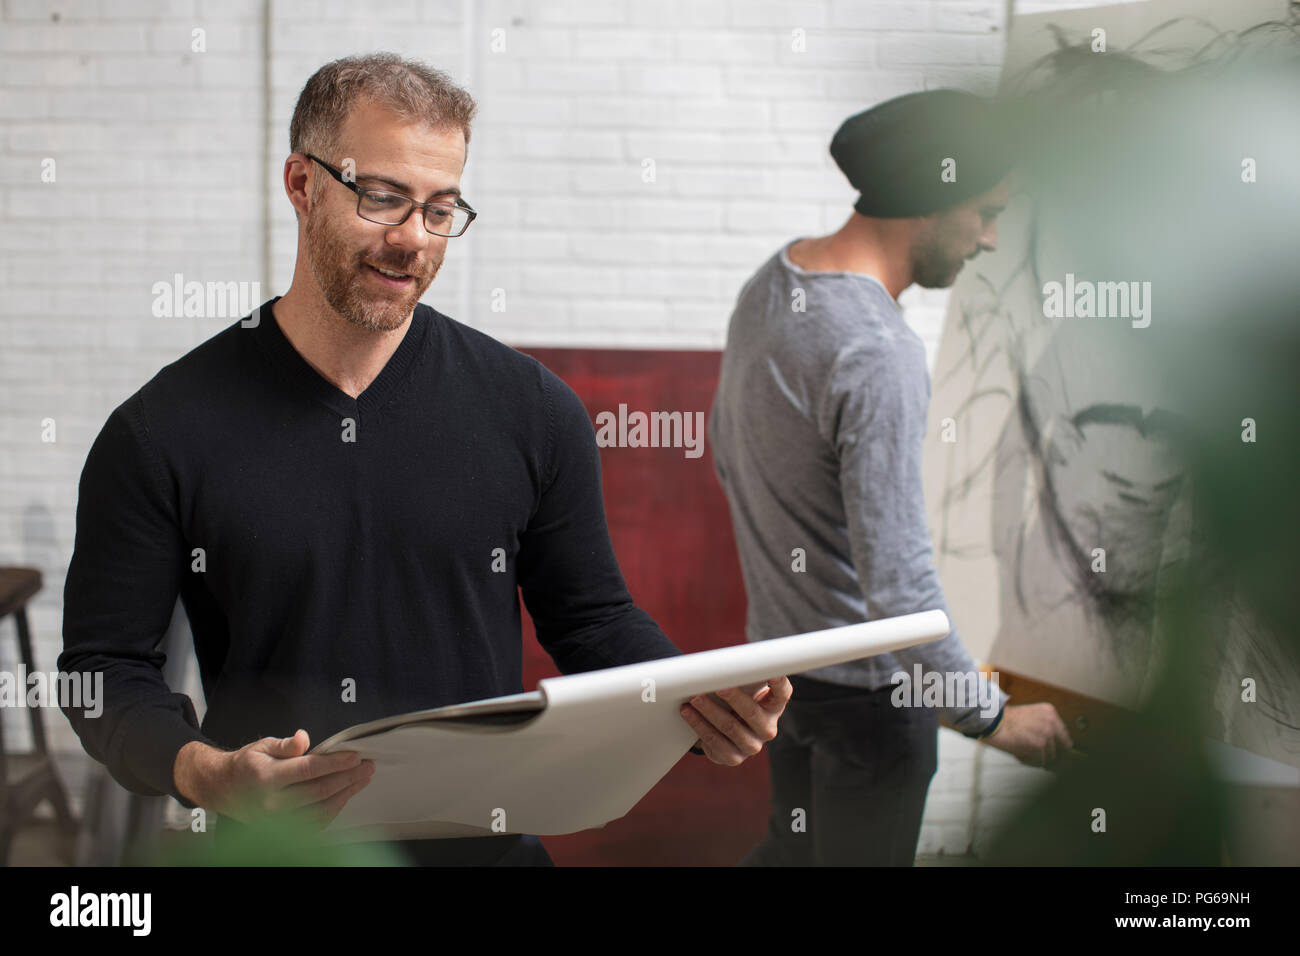 Smiling man looking at sketchbook in artist's studio - Stock Image